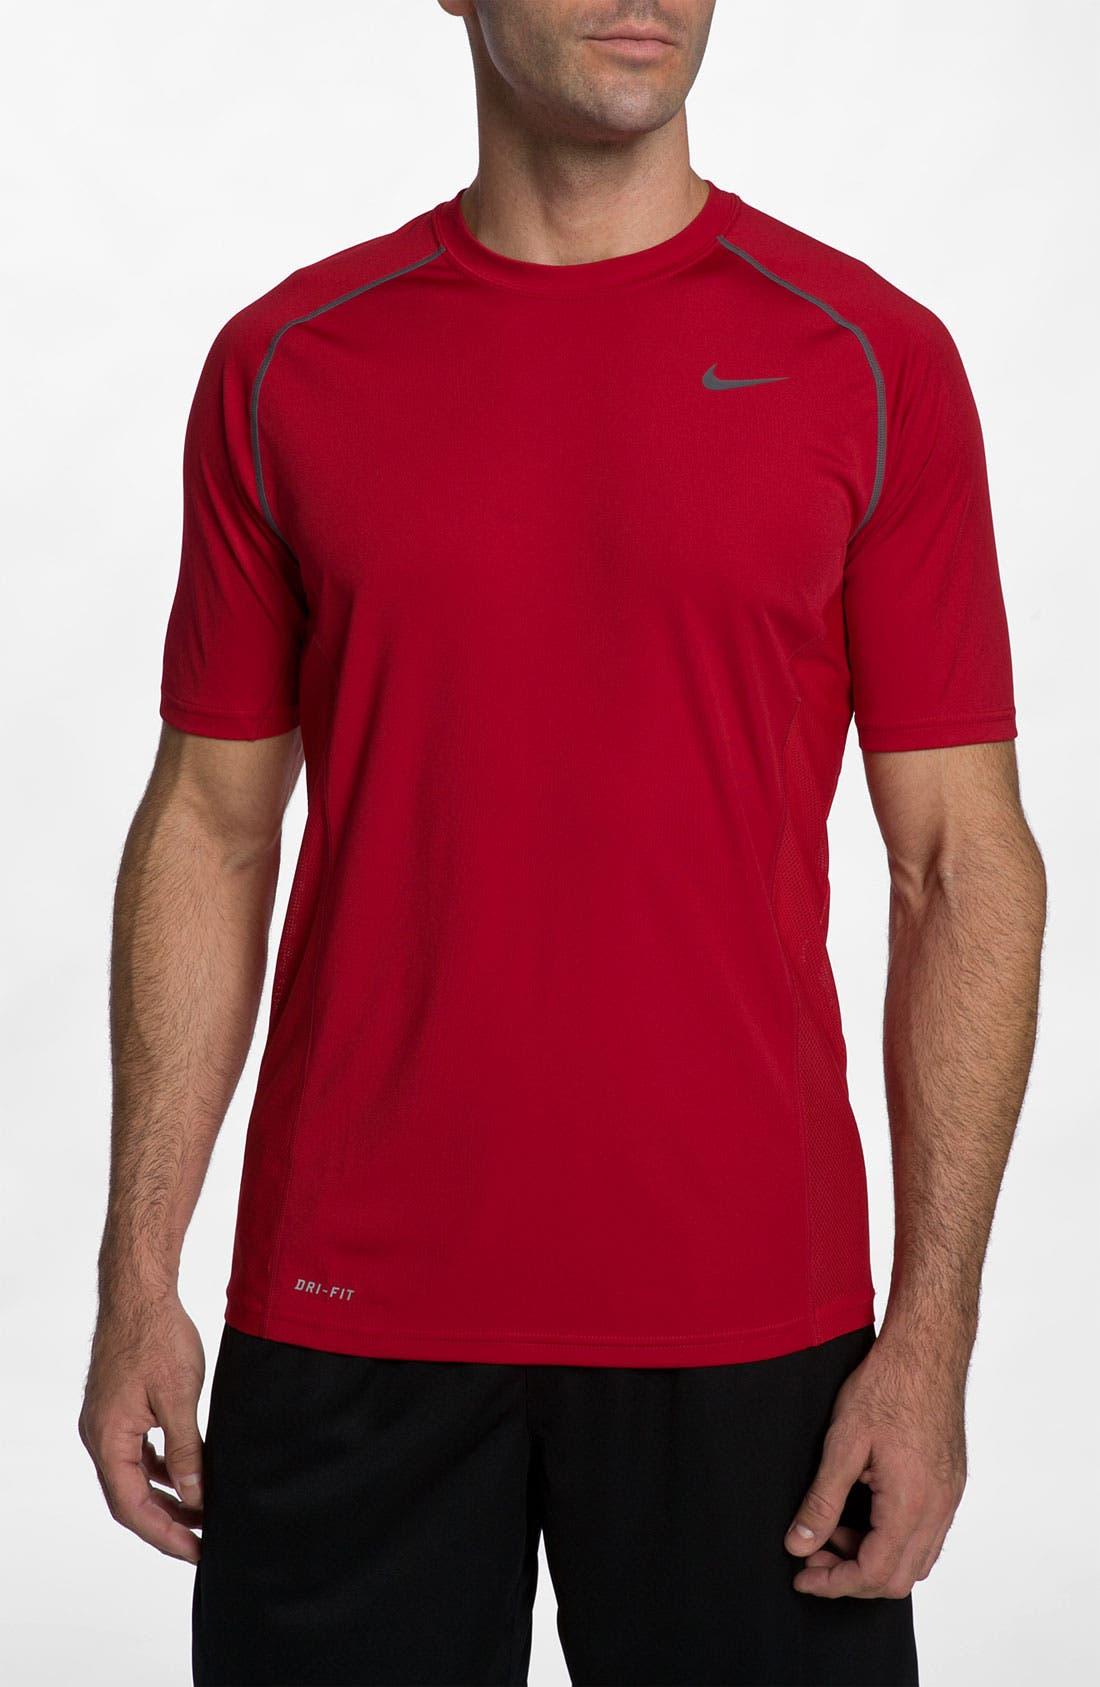 Alternate Image 1 Selected - Nike 'Speed Legend 2.0' T-Shirt